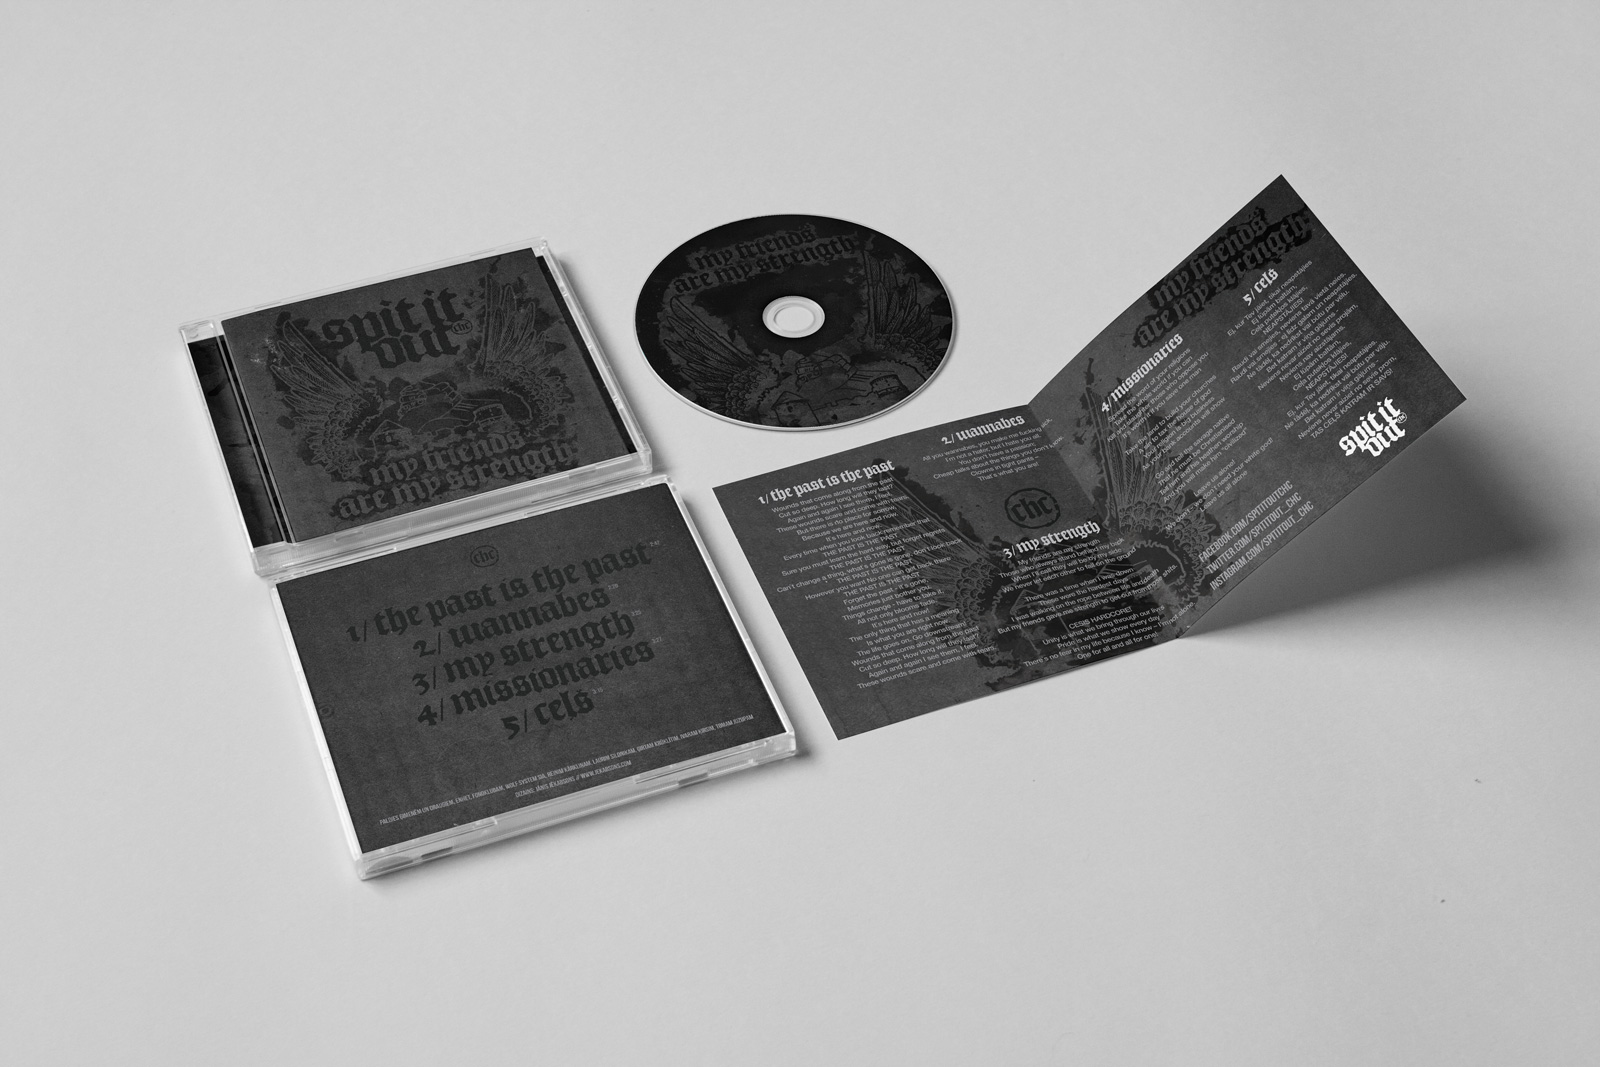 JekabsonsDotCom_SpitItOut_MFAMS_Cover_Art_design_cd_jewelcase_03